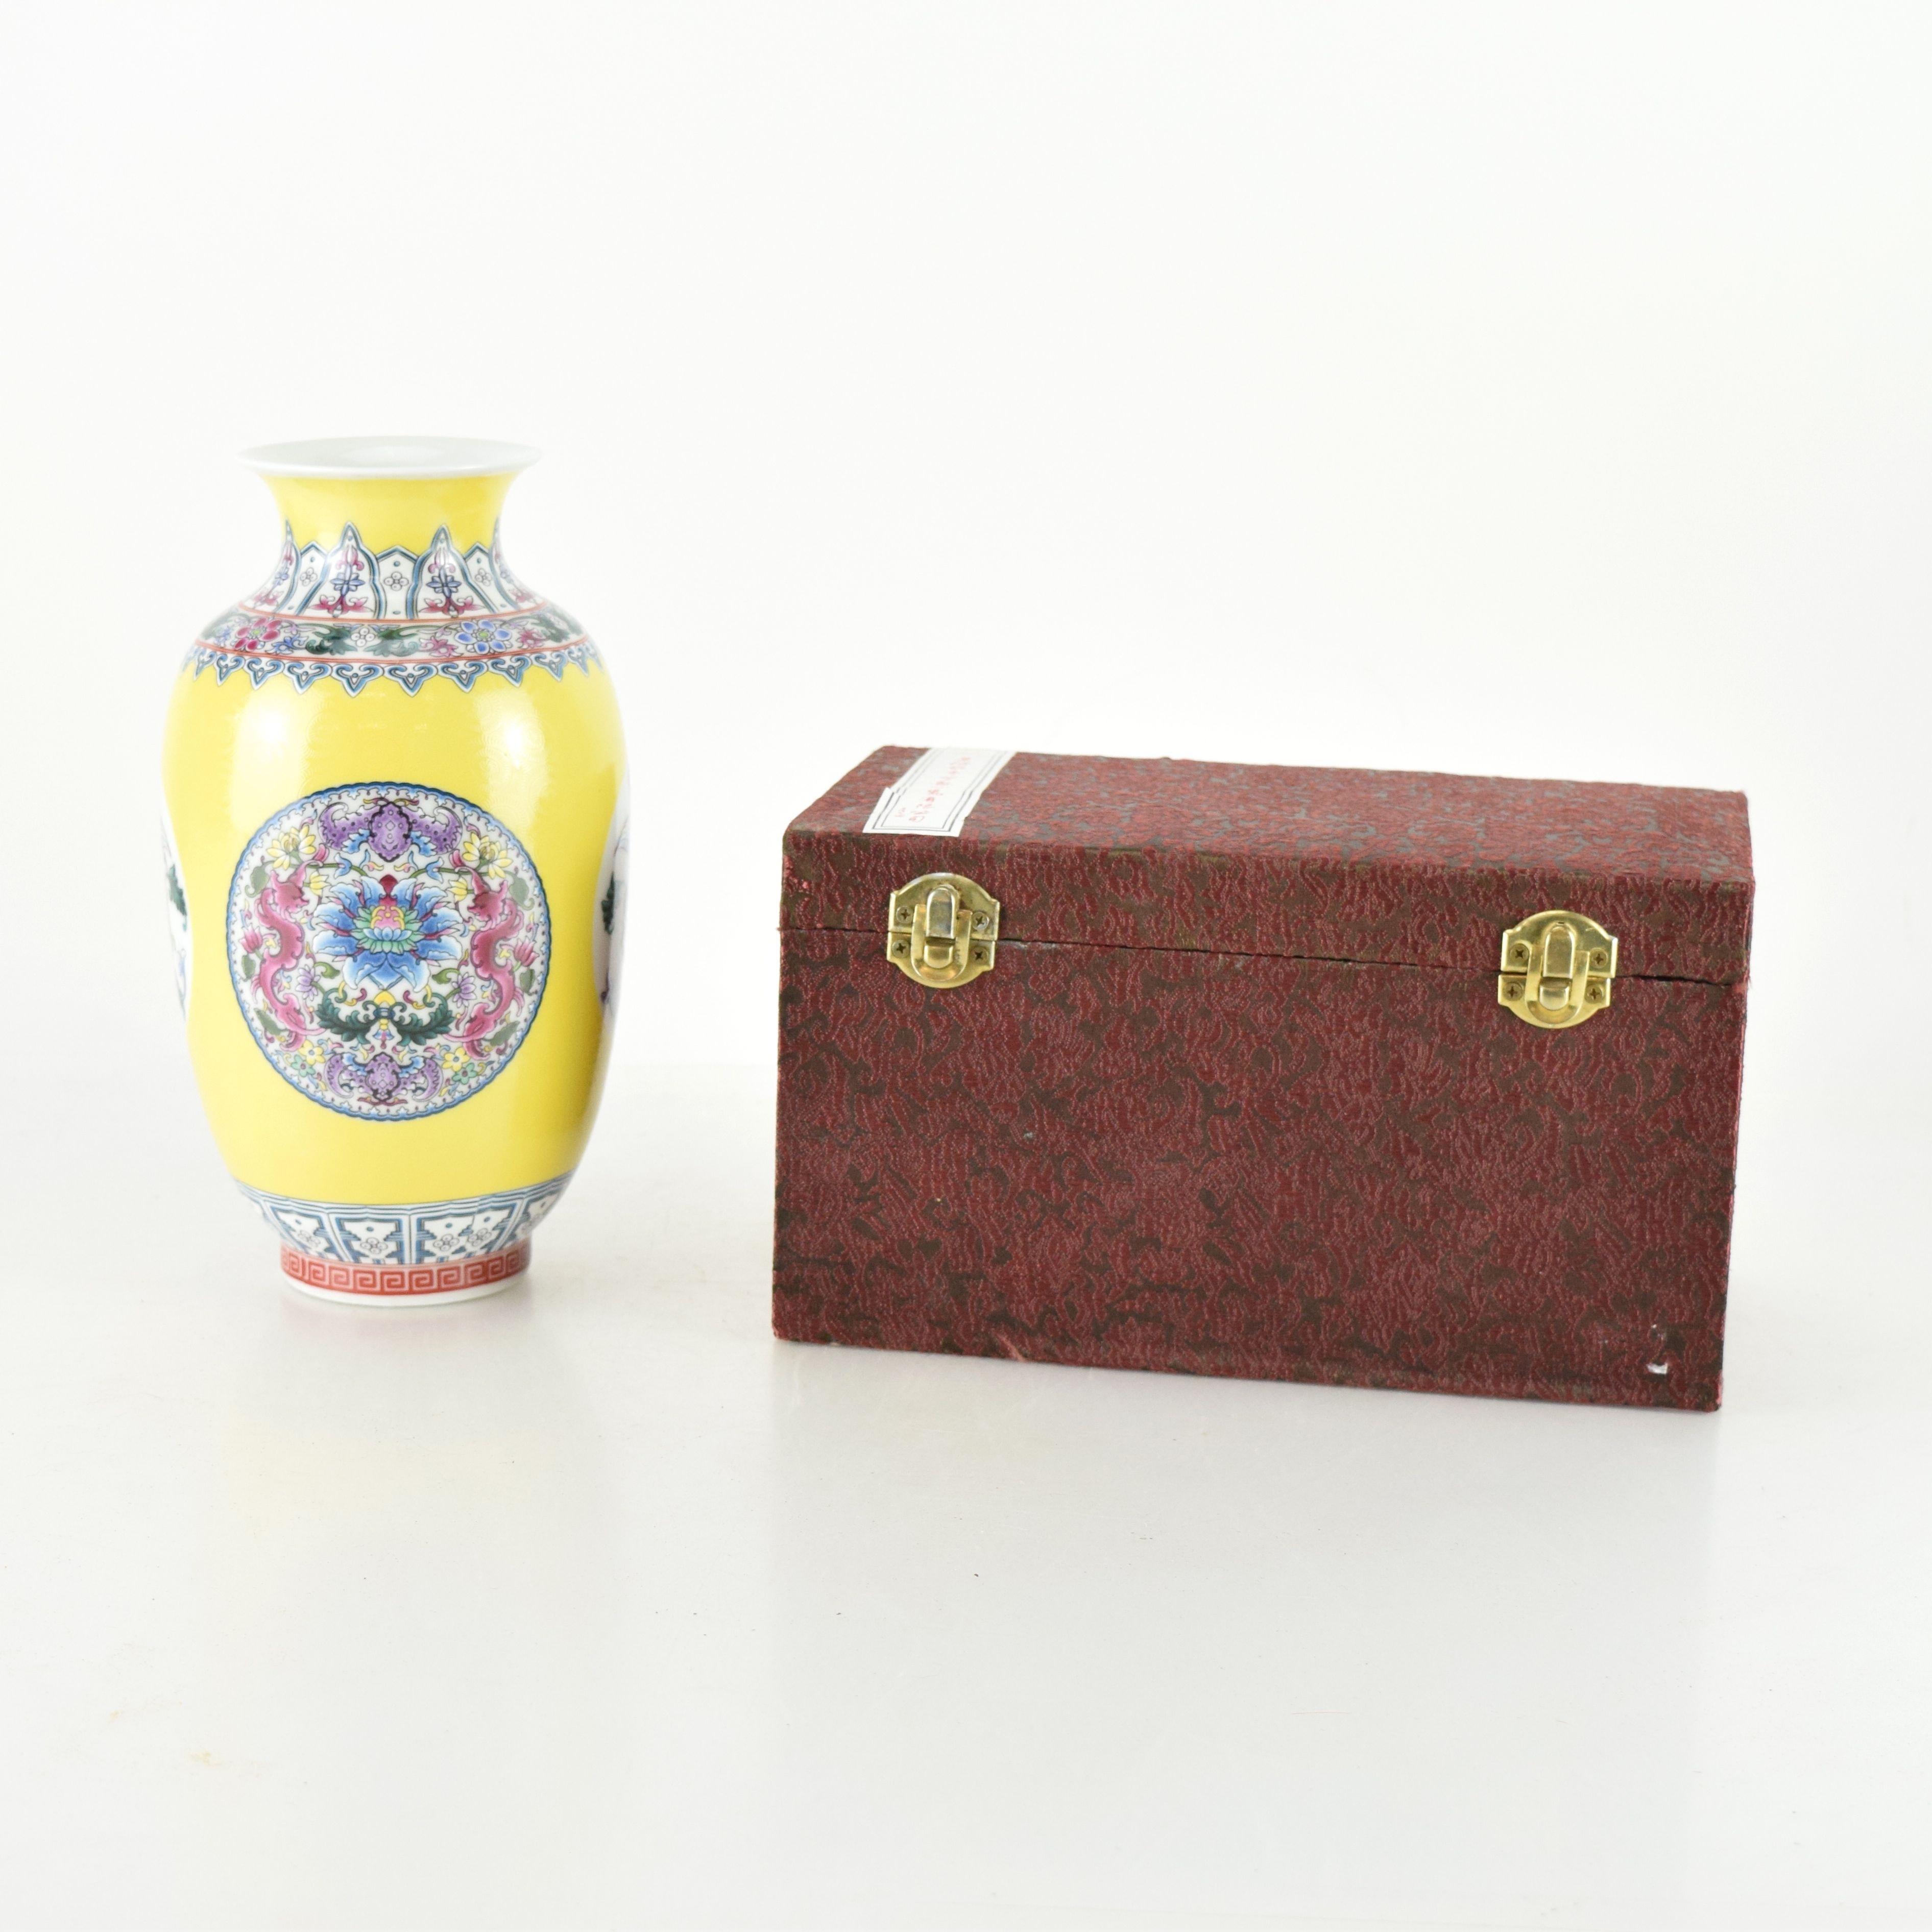 Chinese Porcelain Vase in Case